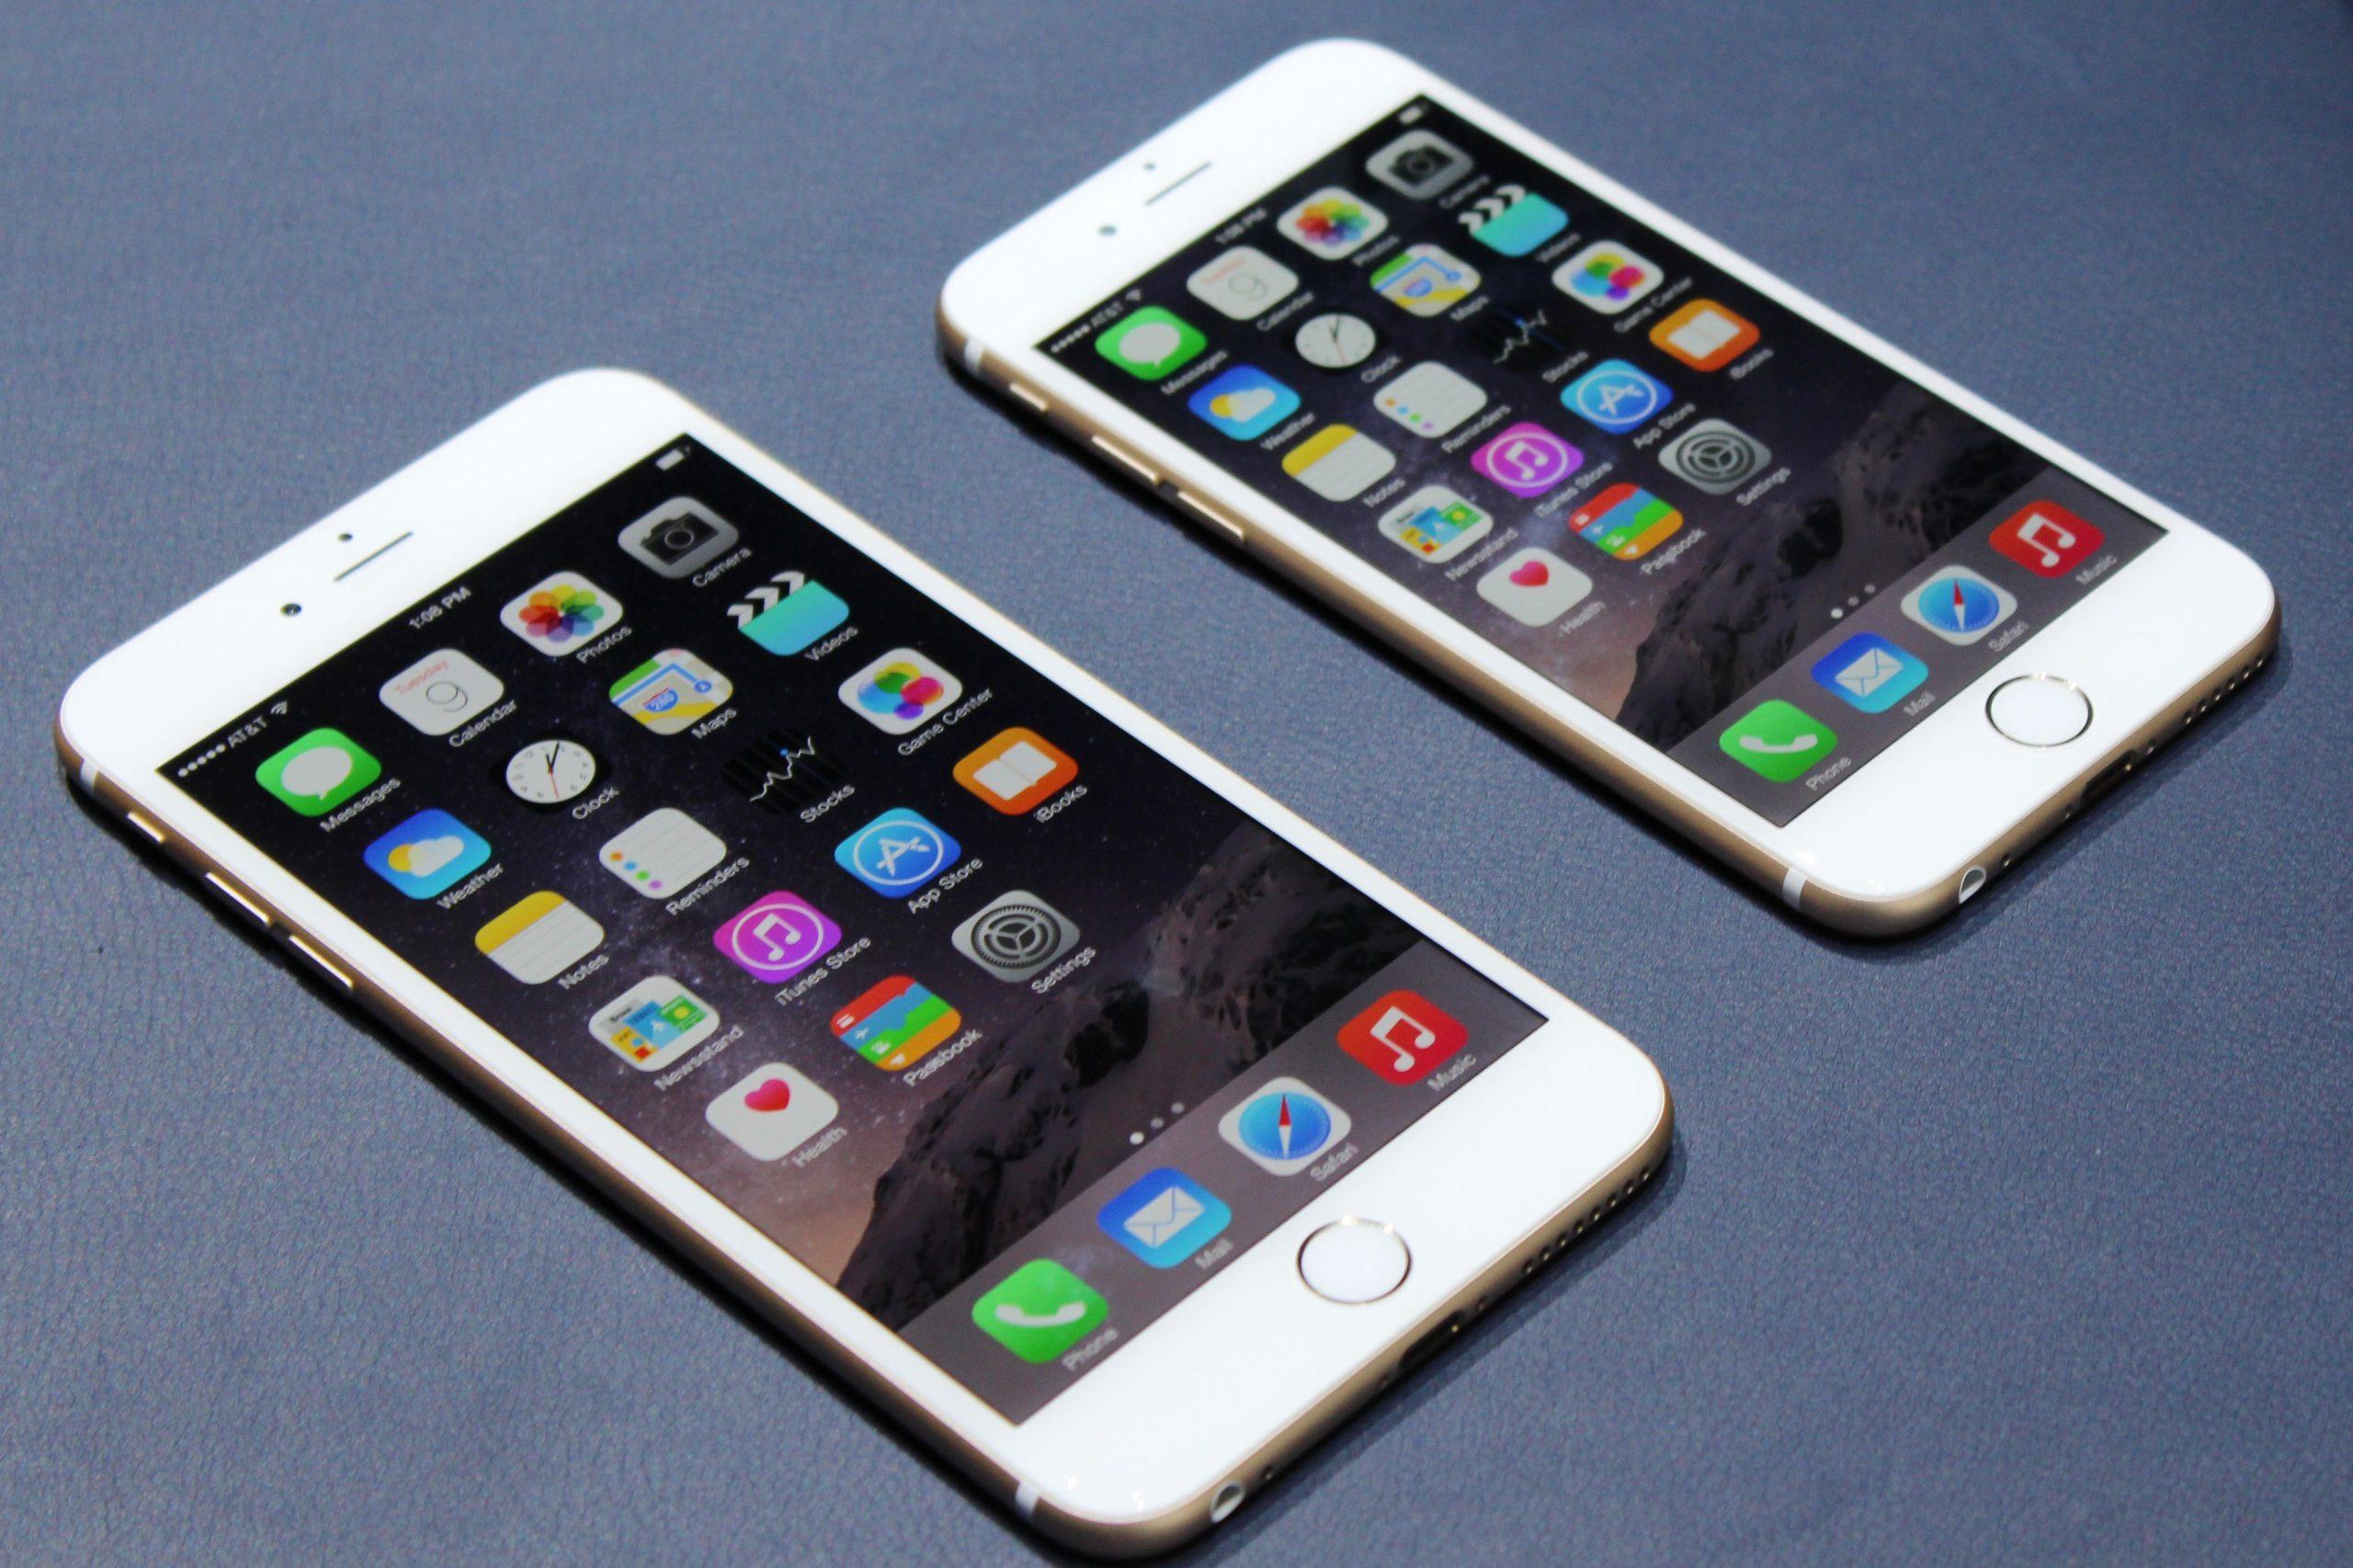 iPhone-6-Plus-Developer-Unboxing